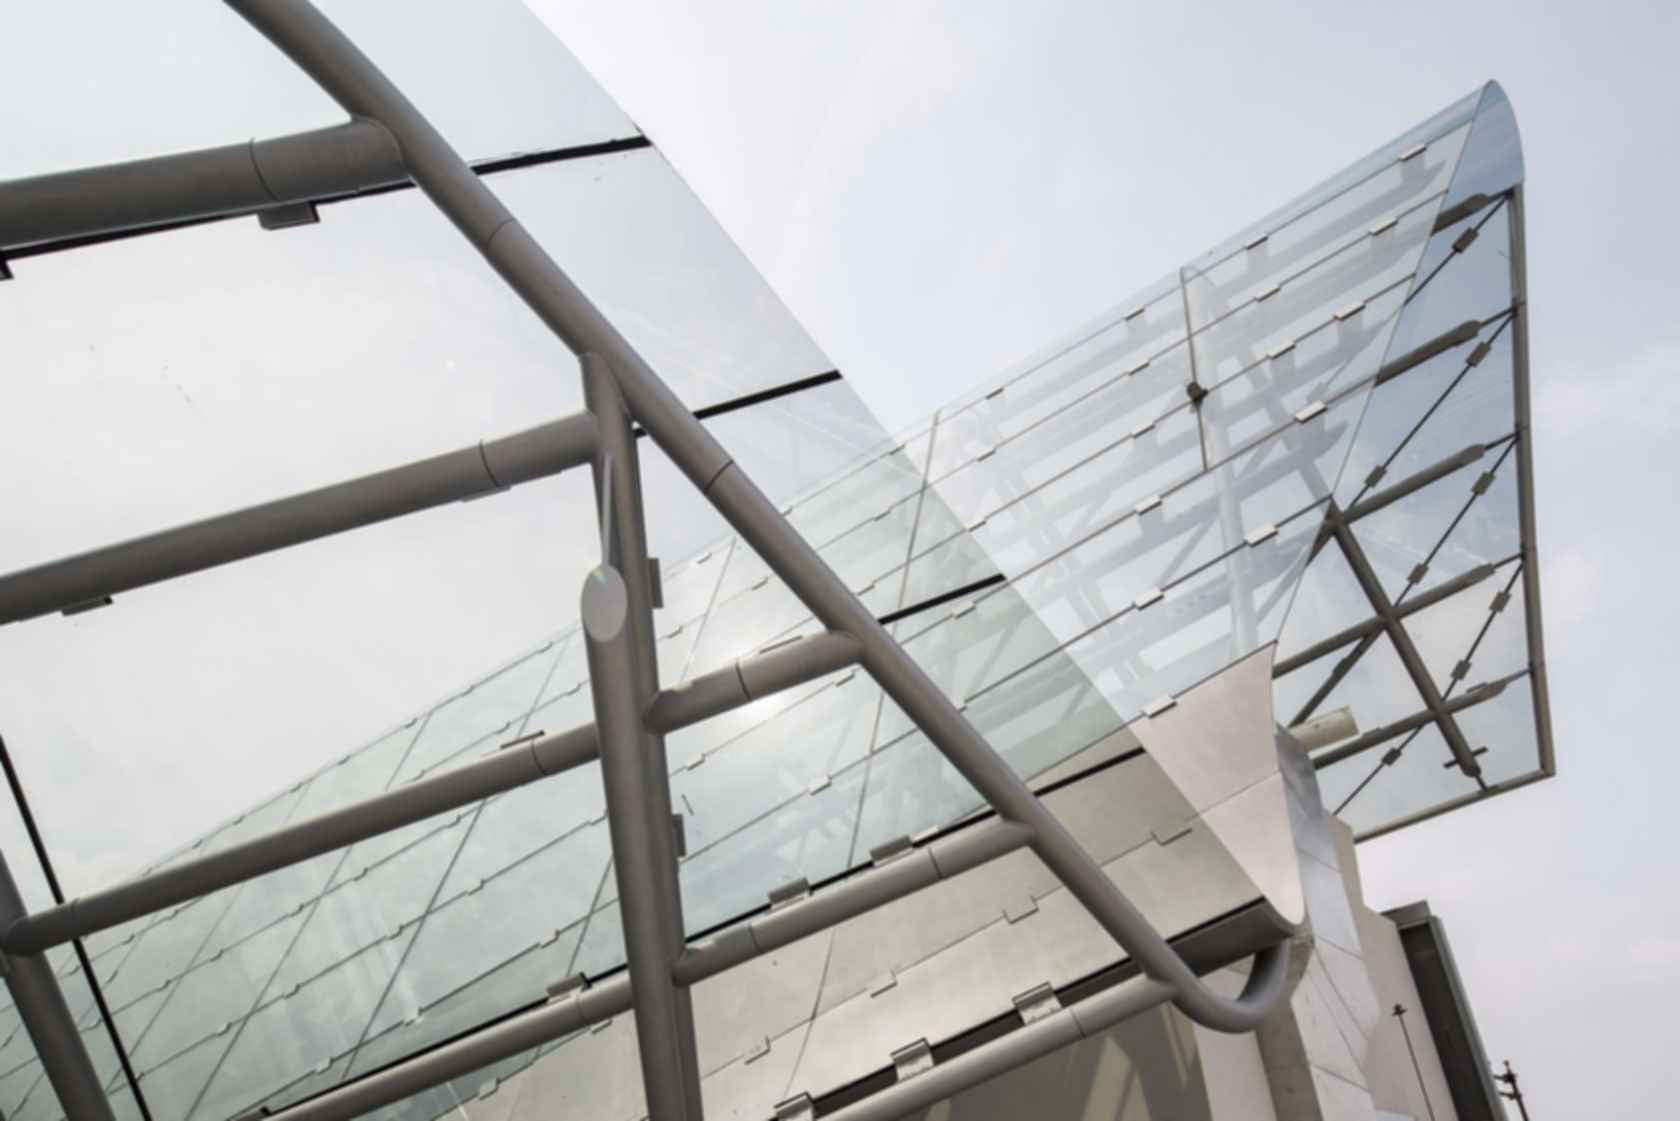 Italy Pavilion (Palazzo Italia) - Exterior Glass Roof